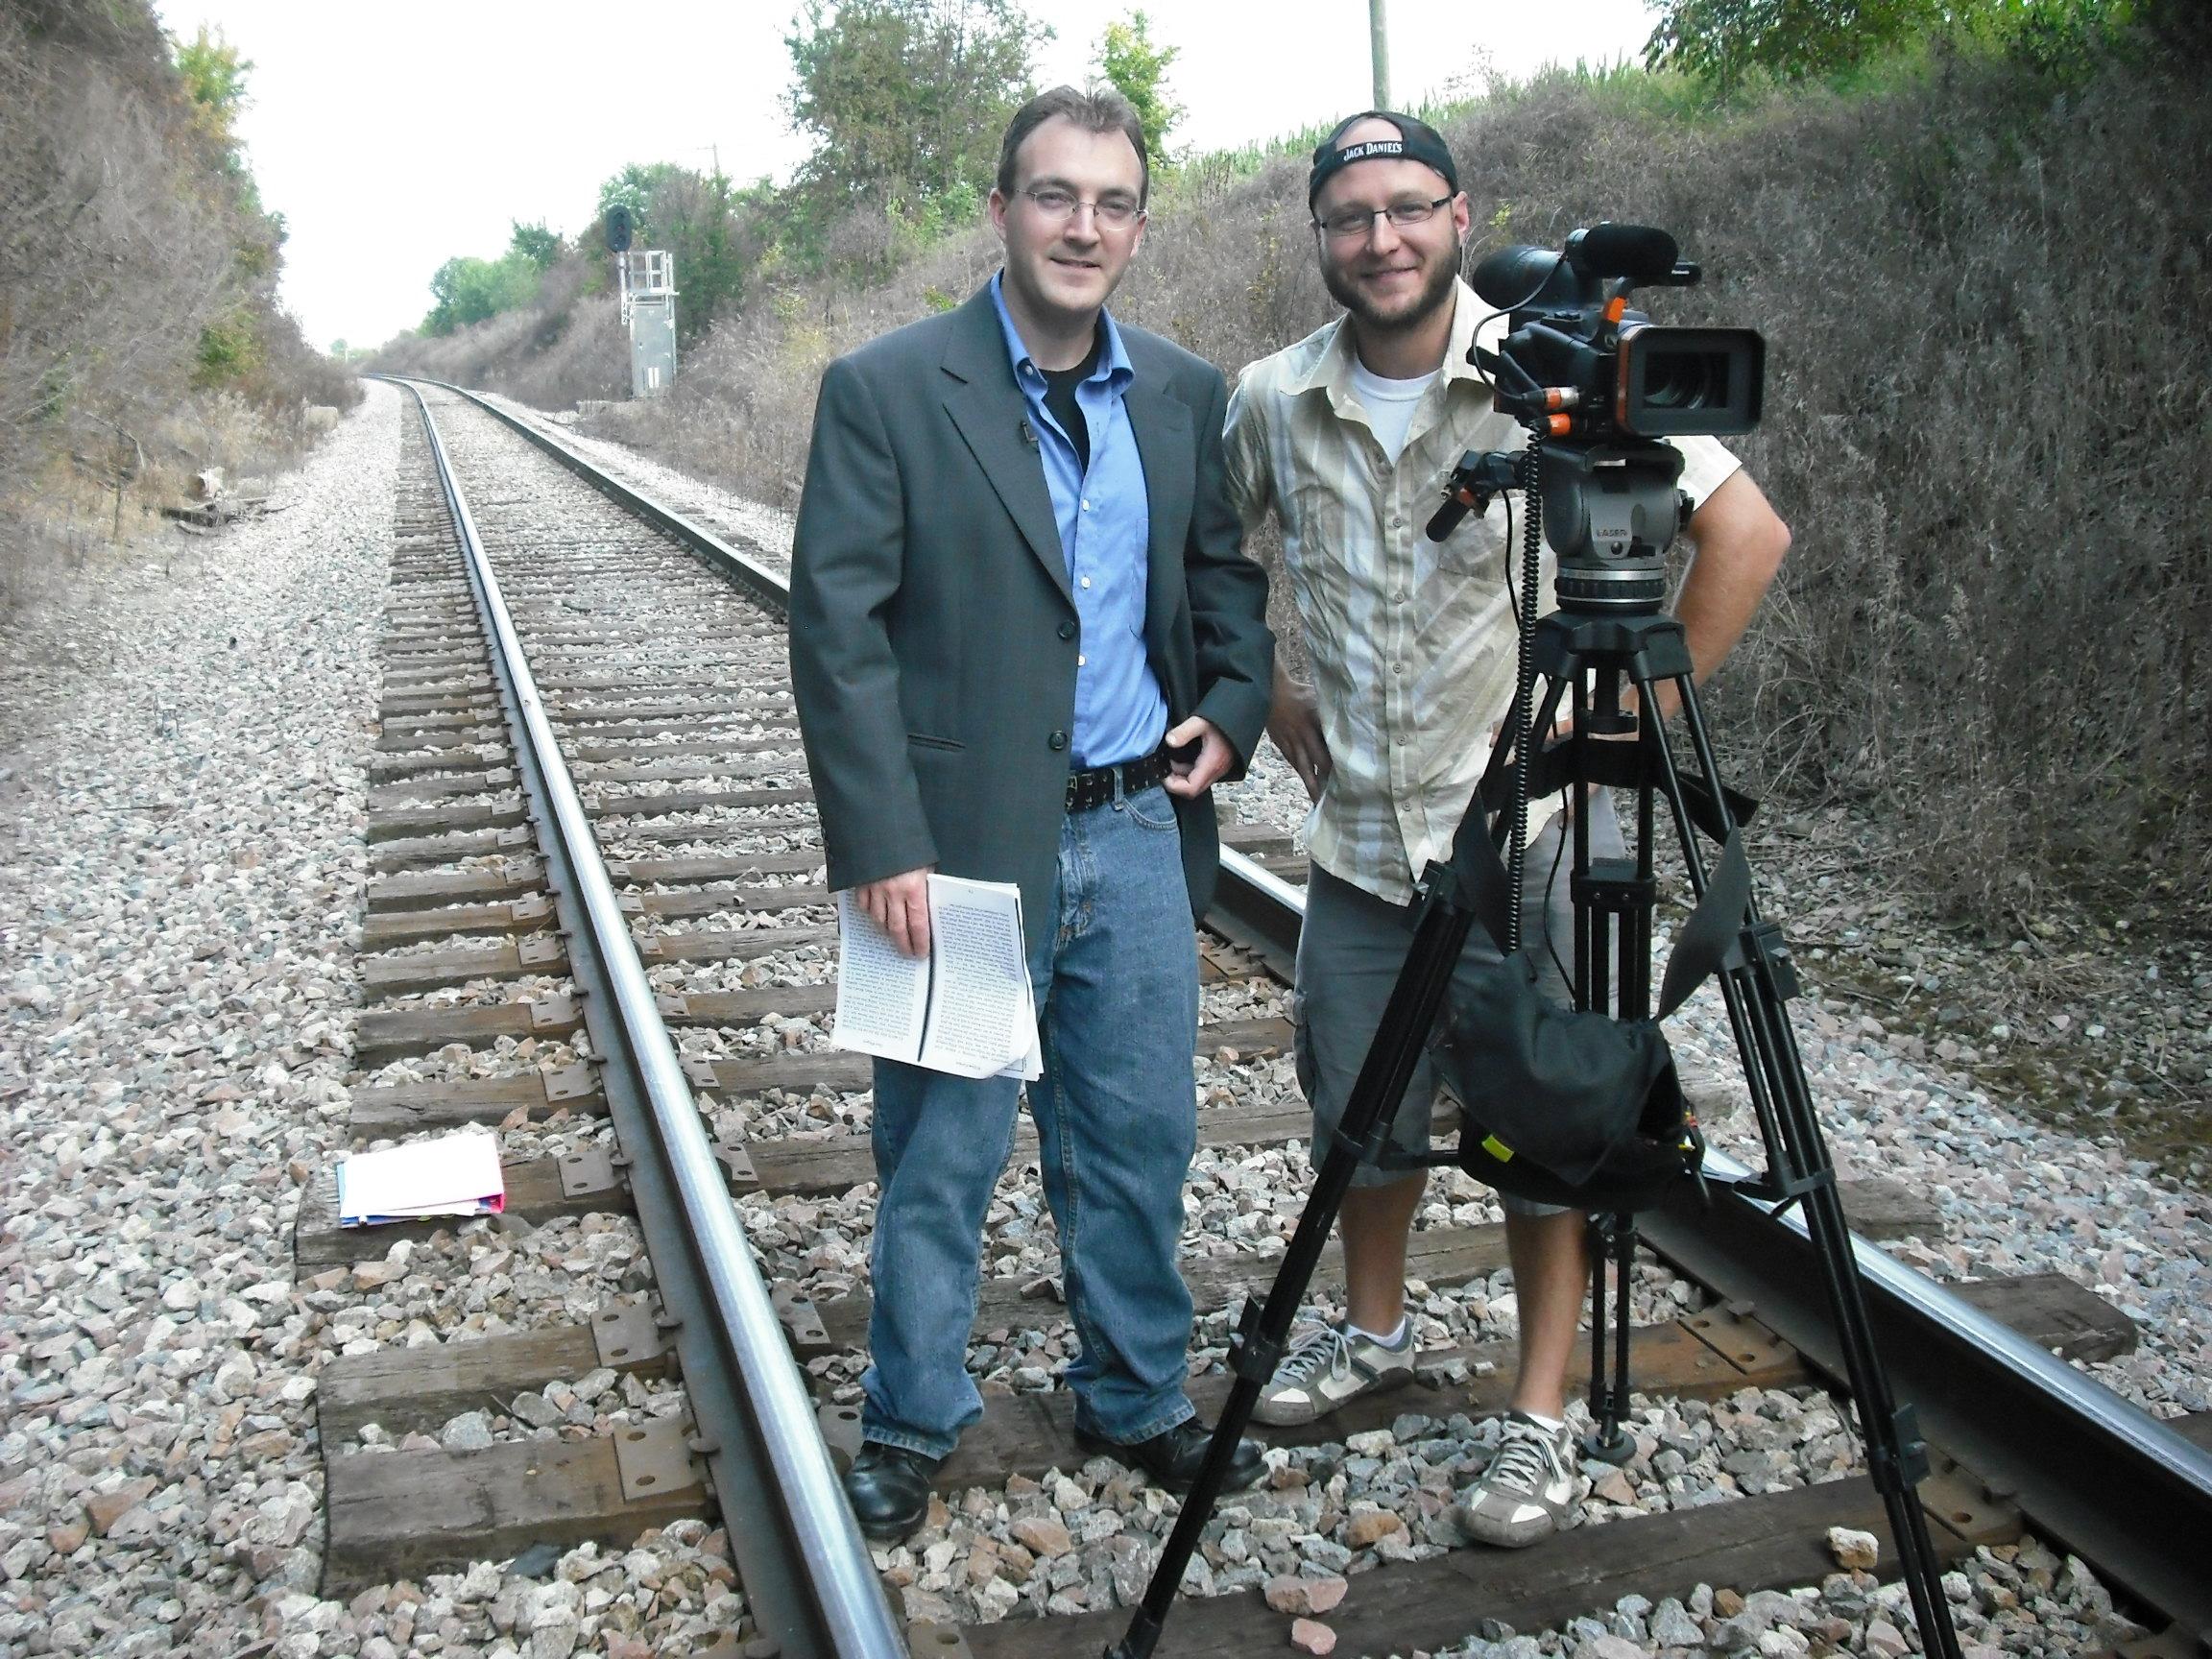 The cameraman, Josh Tallo, and I